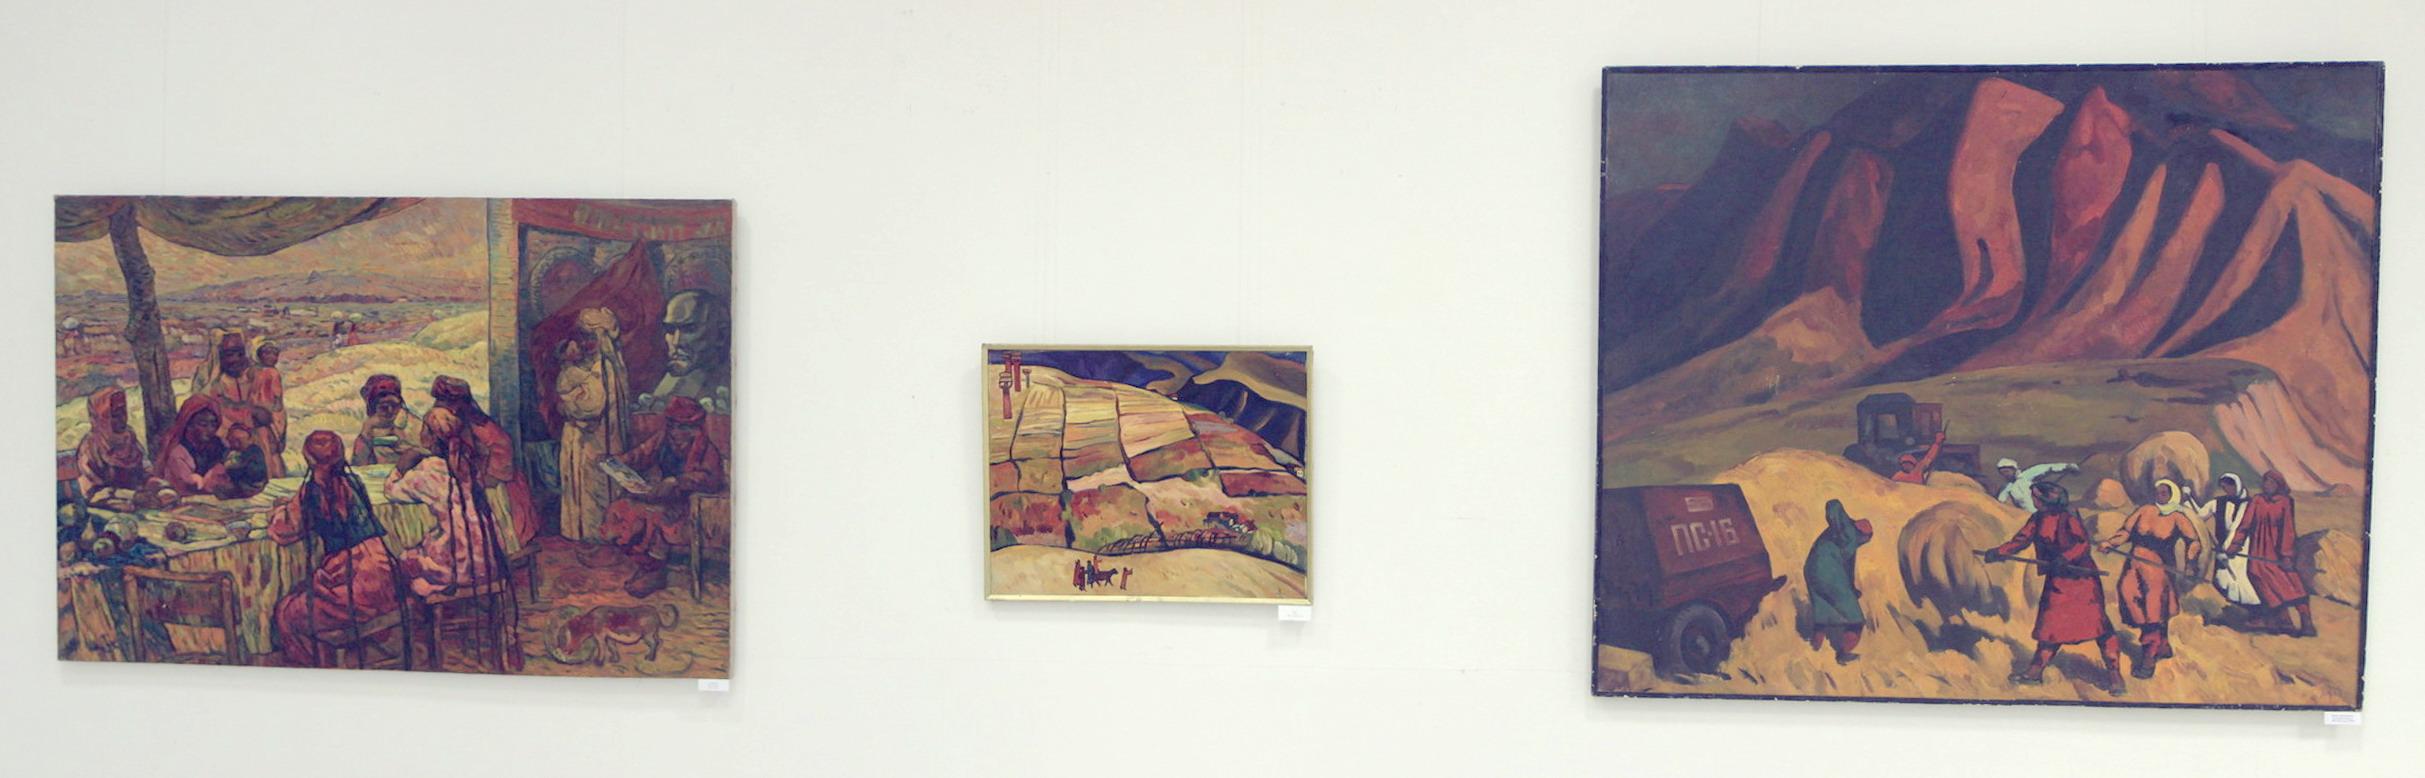 Николай Шин. Экспозиция картин. (2)